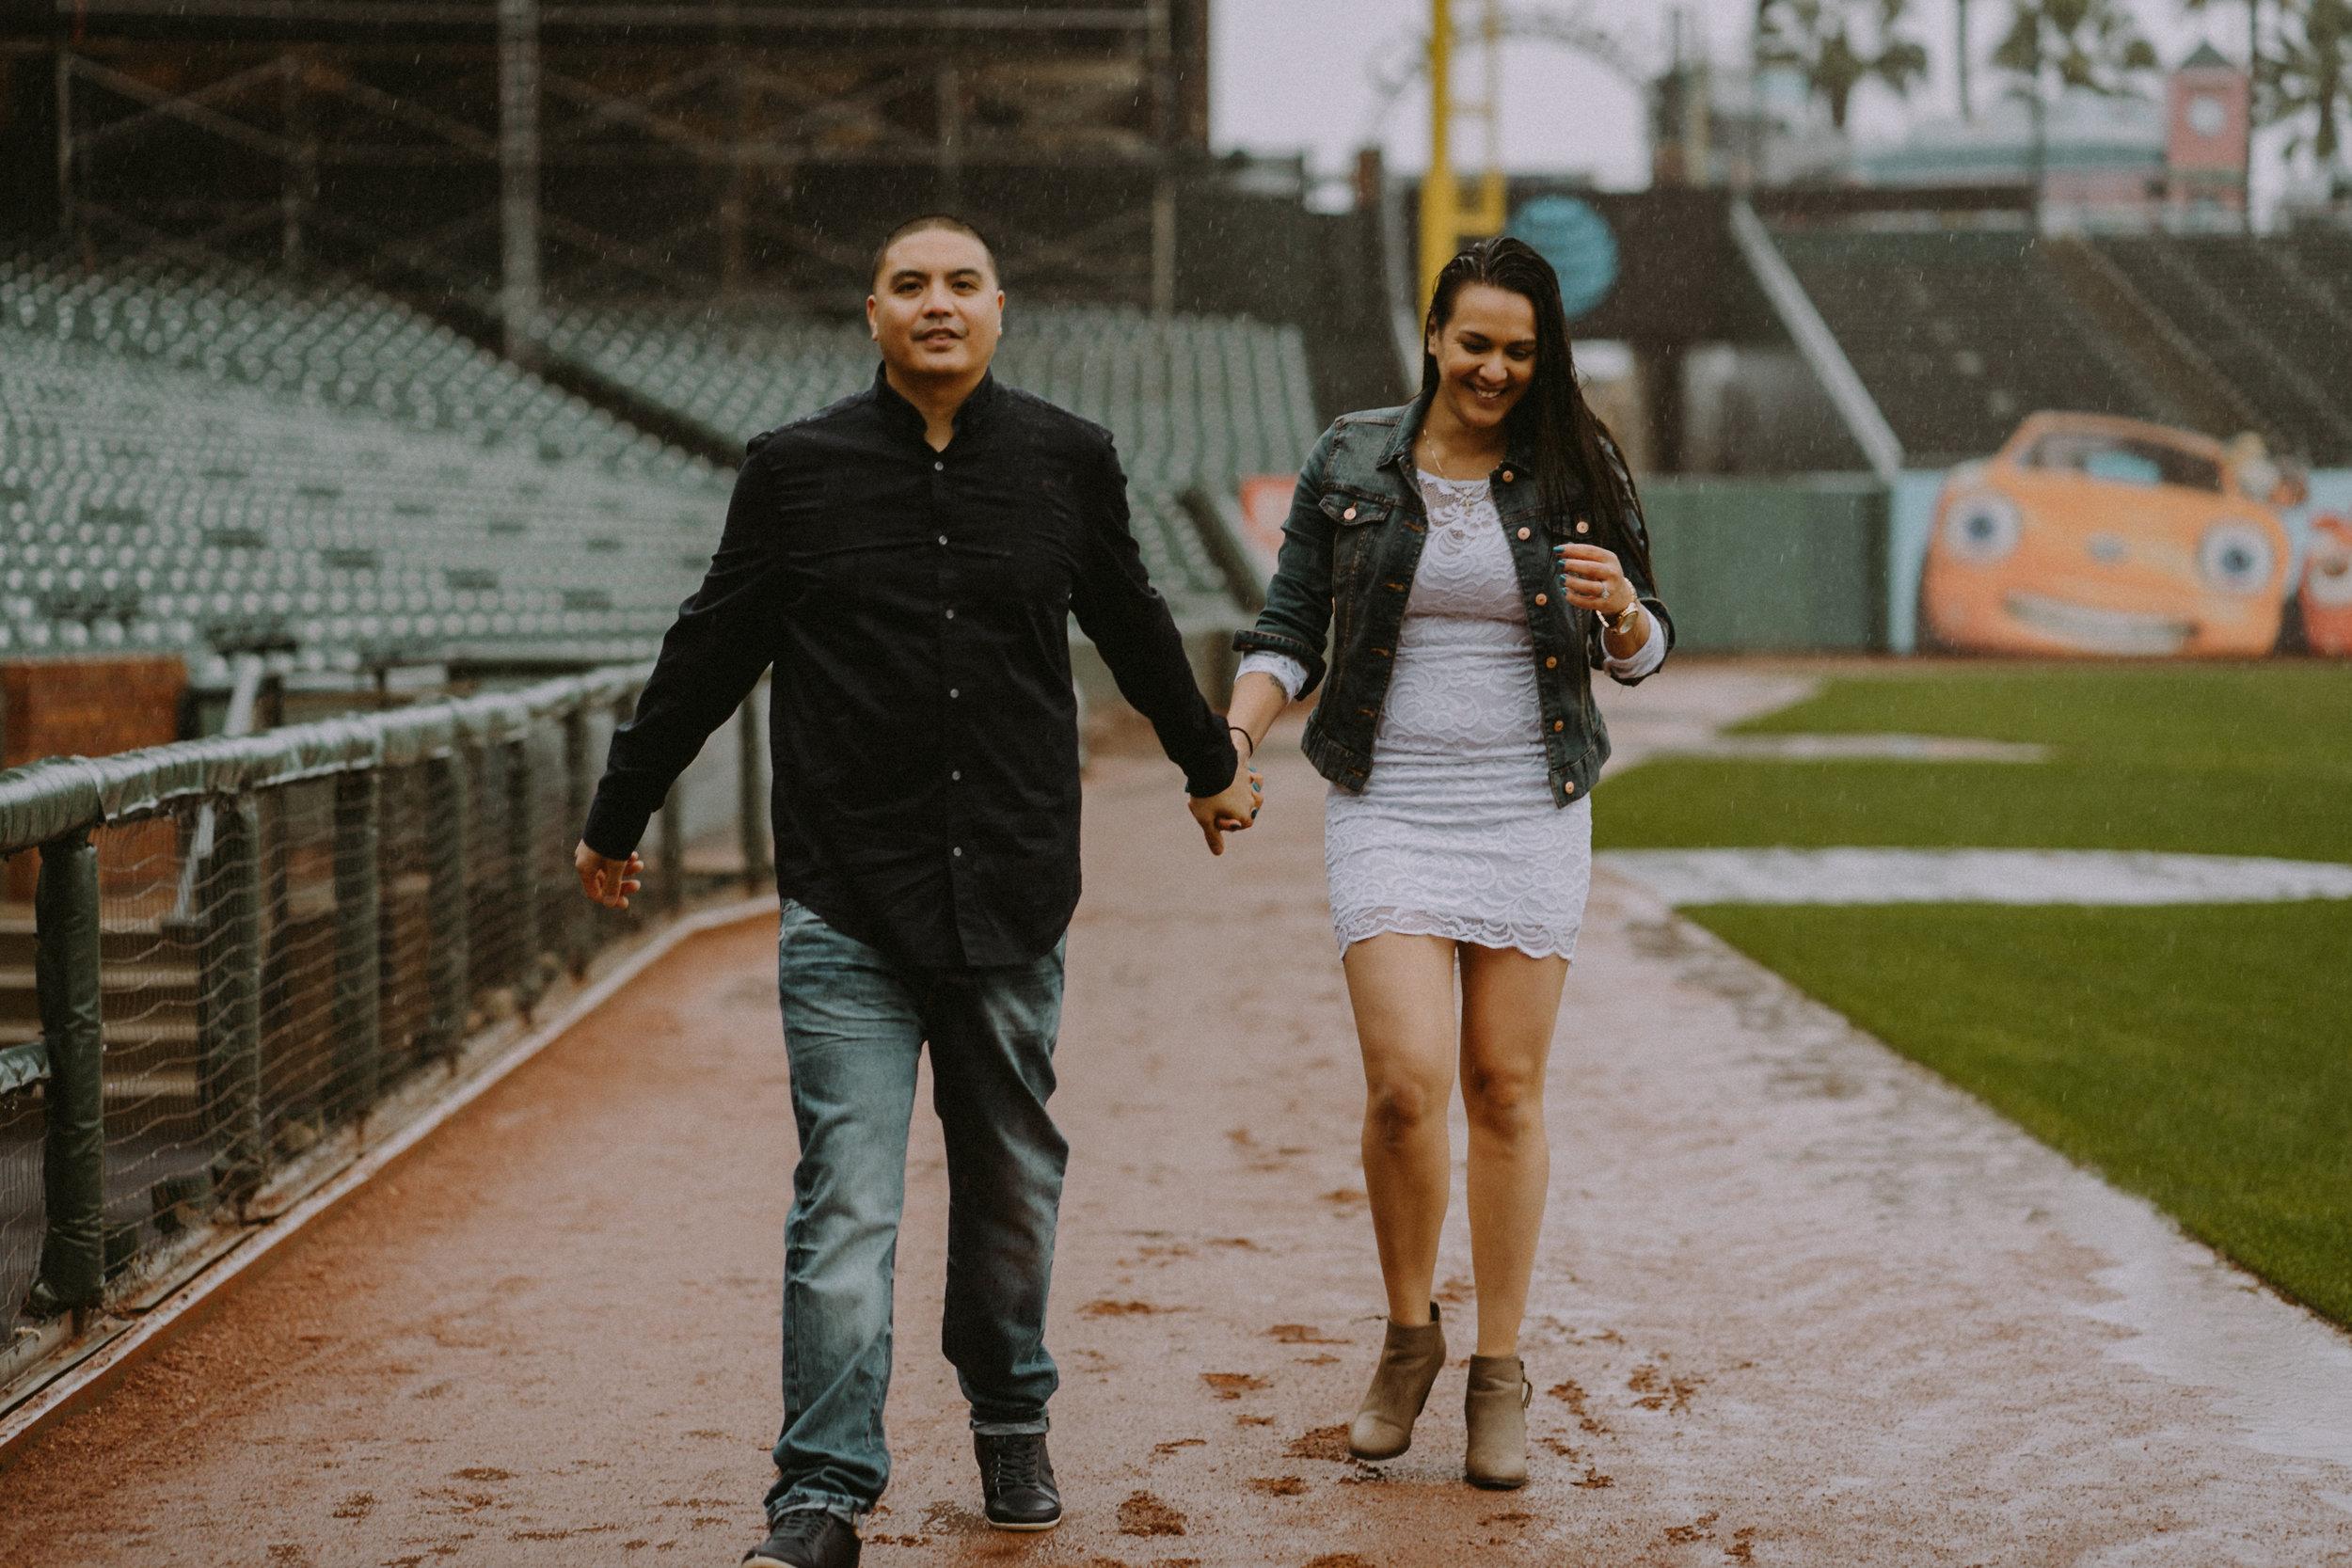 San-Francisco-engagement-wedding-photographer-Giants-AT&T-Park-27.jpg